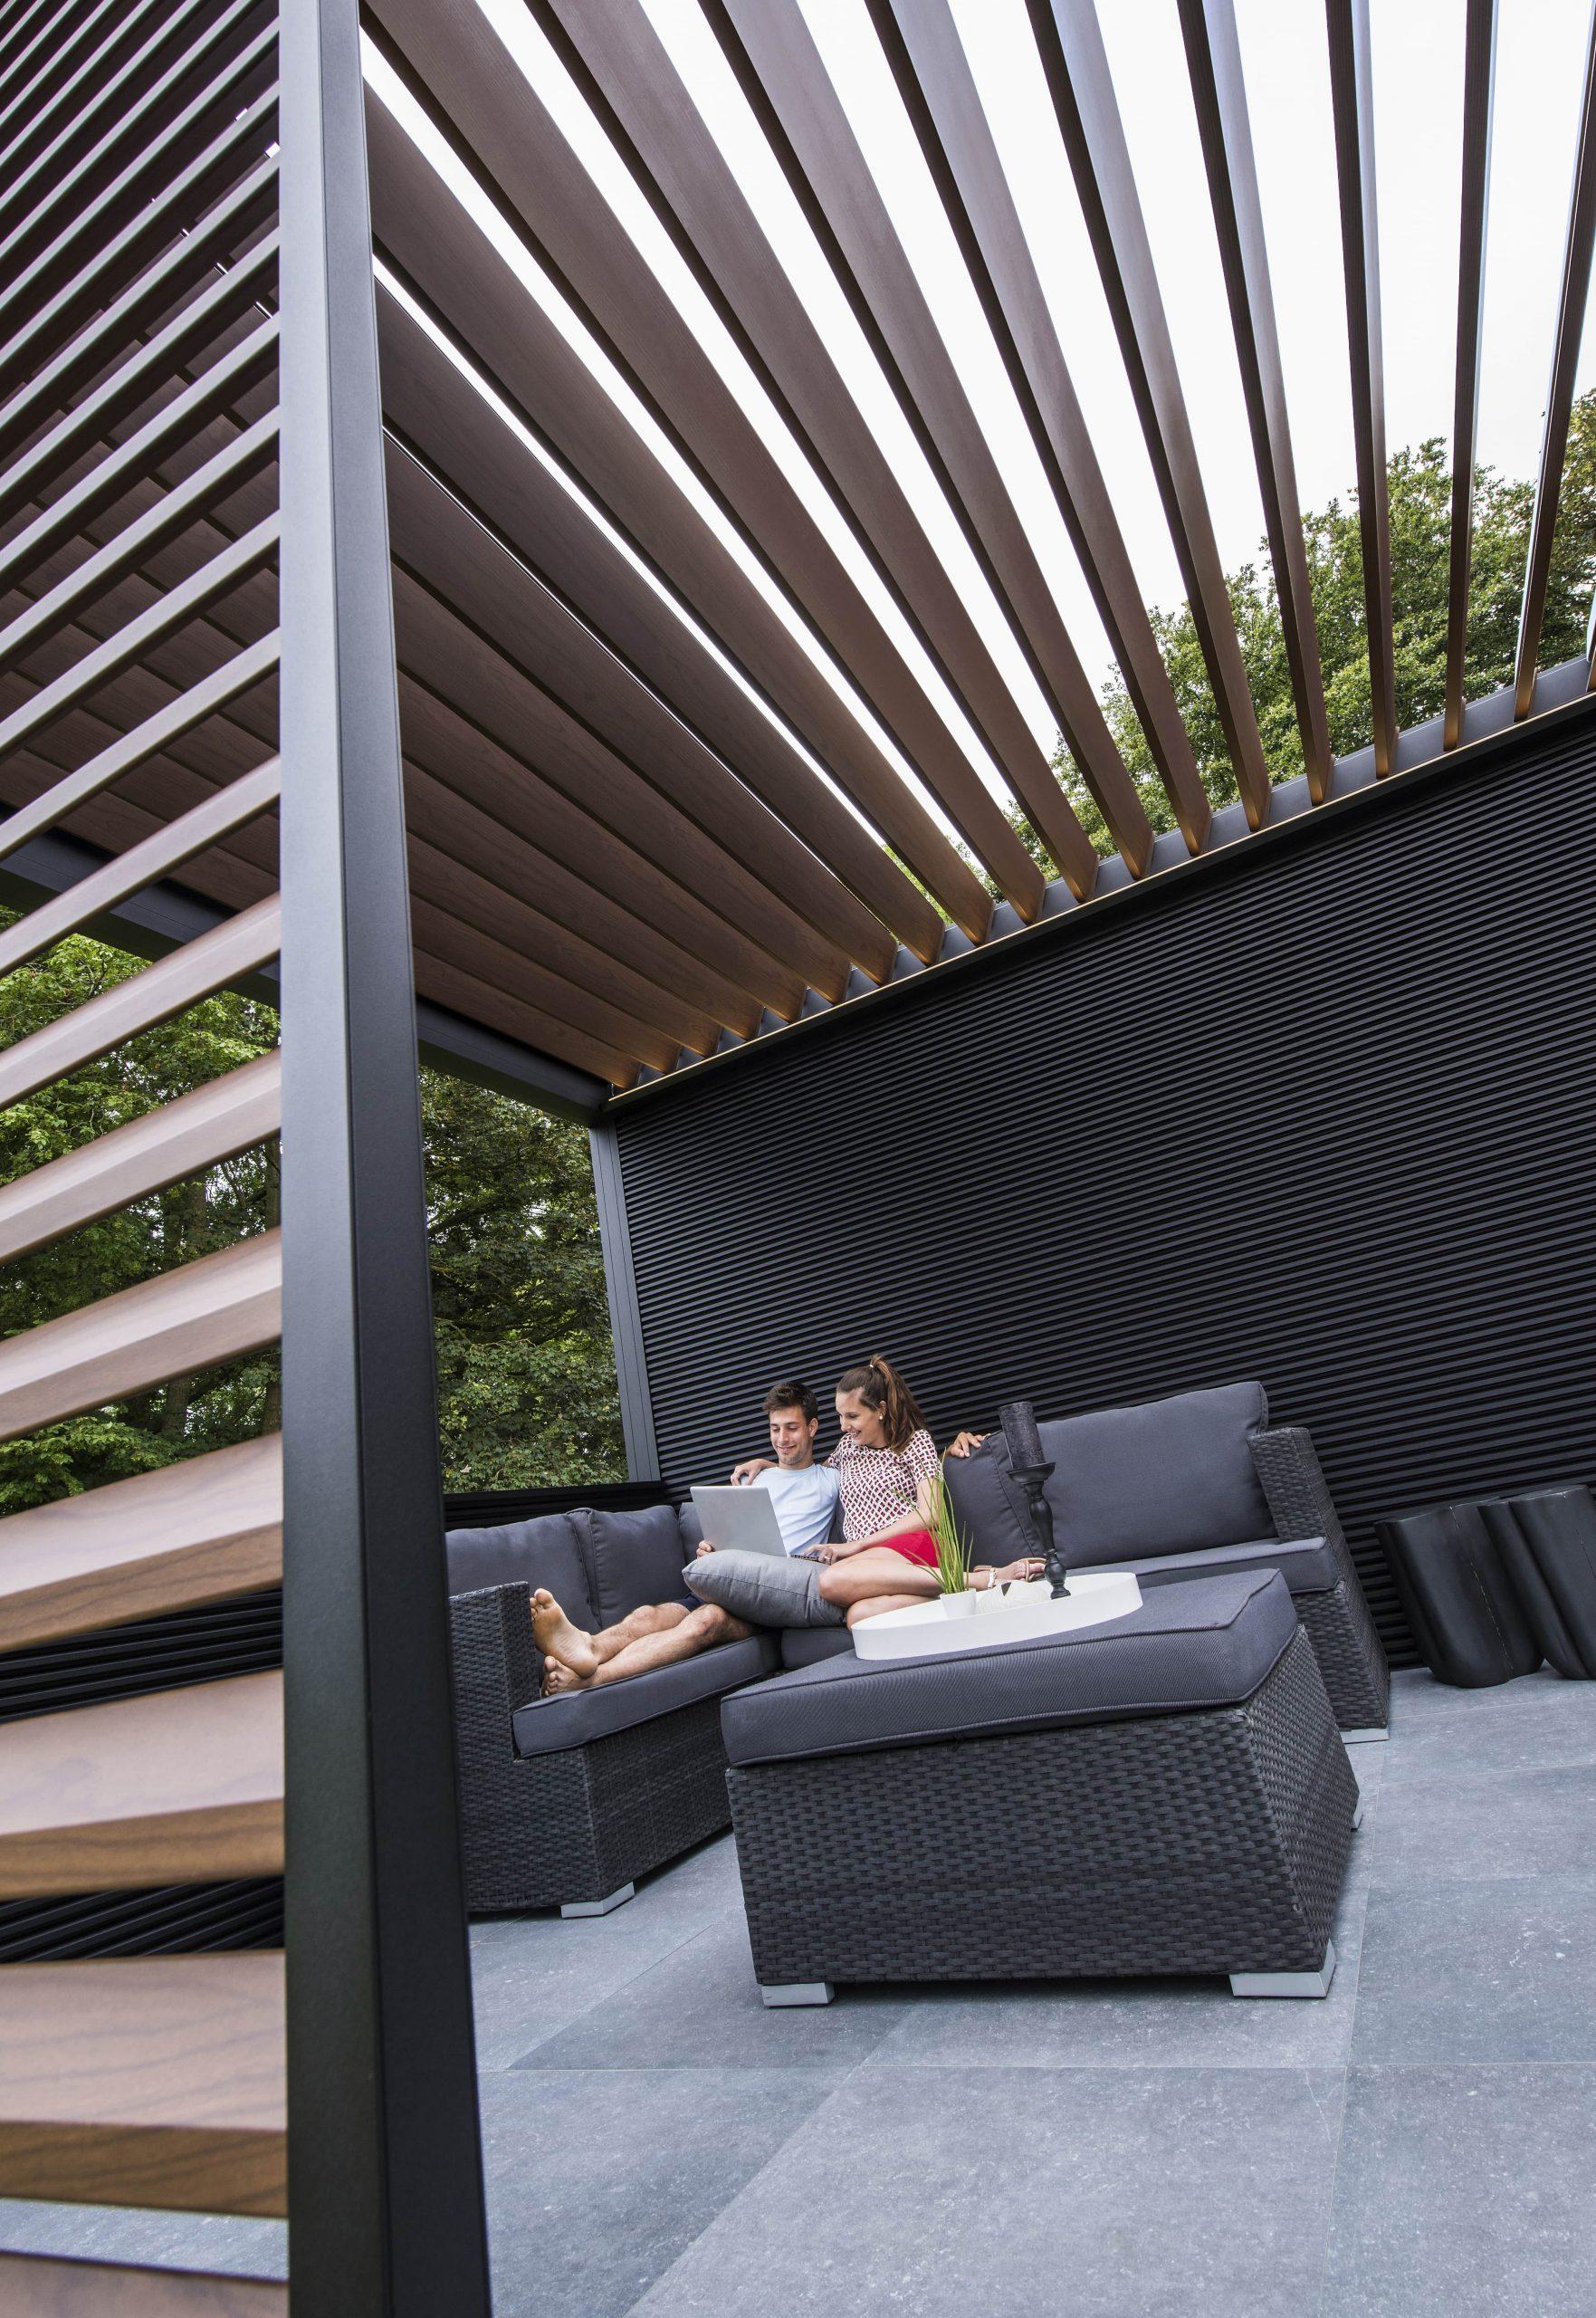 Outdoor Wohnzimer Deluxe: Lamellendach Renson Camargue ... tout Pergola Alu Pour Mobil Home